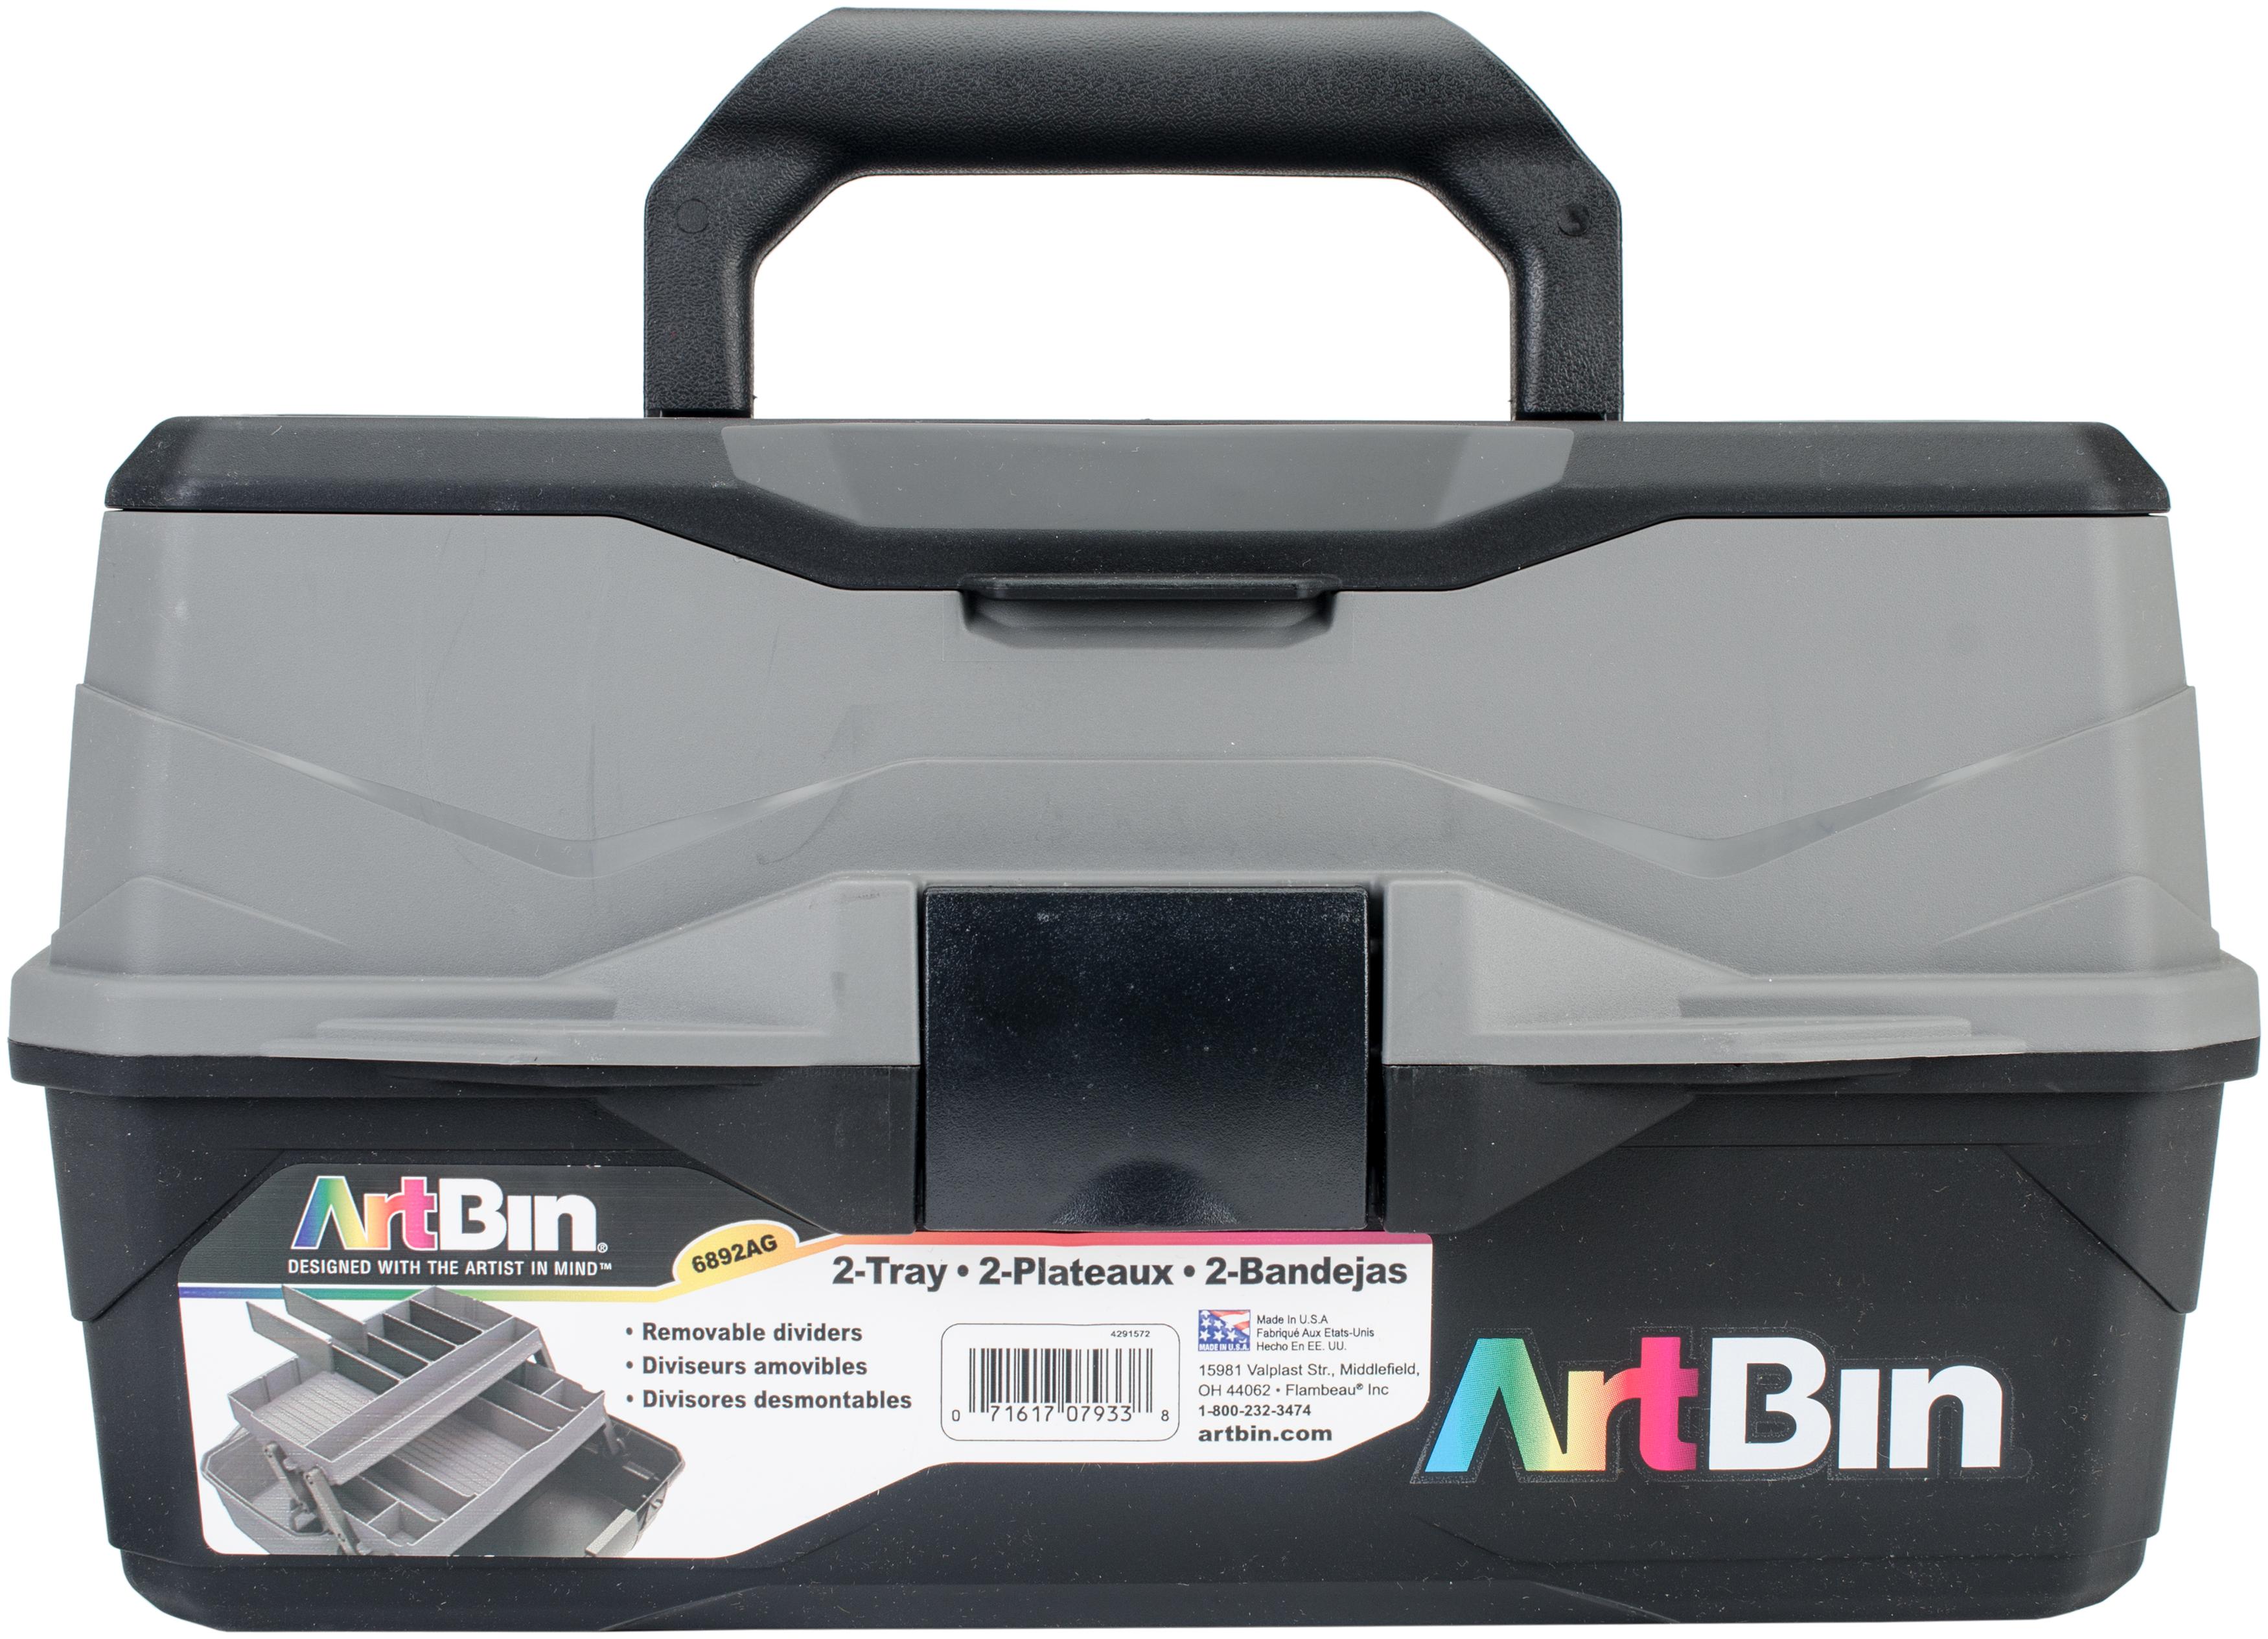 ArtBin Lift Tray Box W/2 Trays & Quick Access Lid Storage-8X14X7.5, Black & Gray